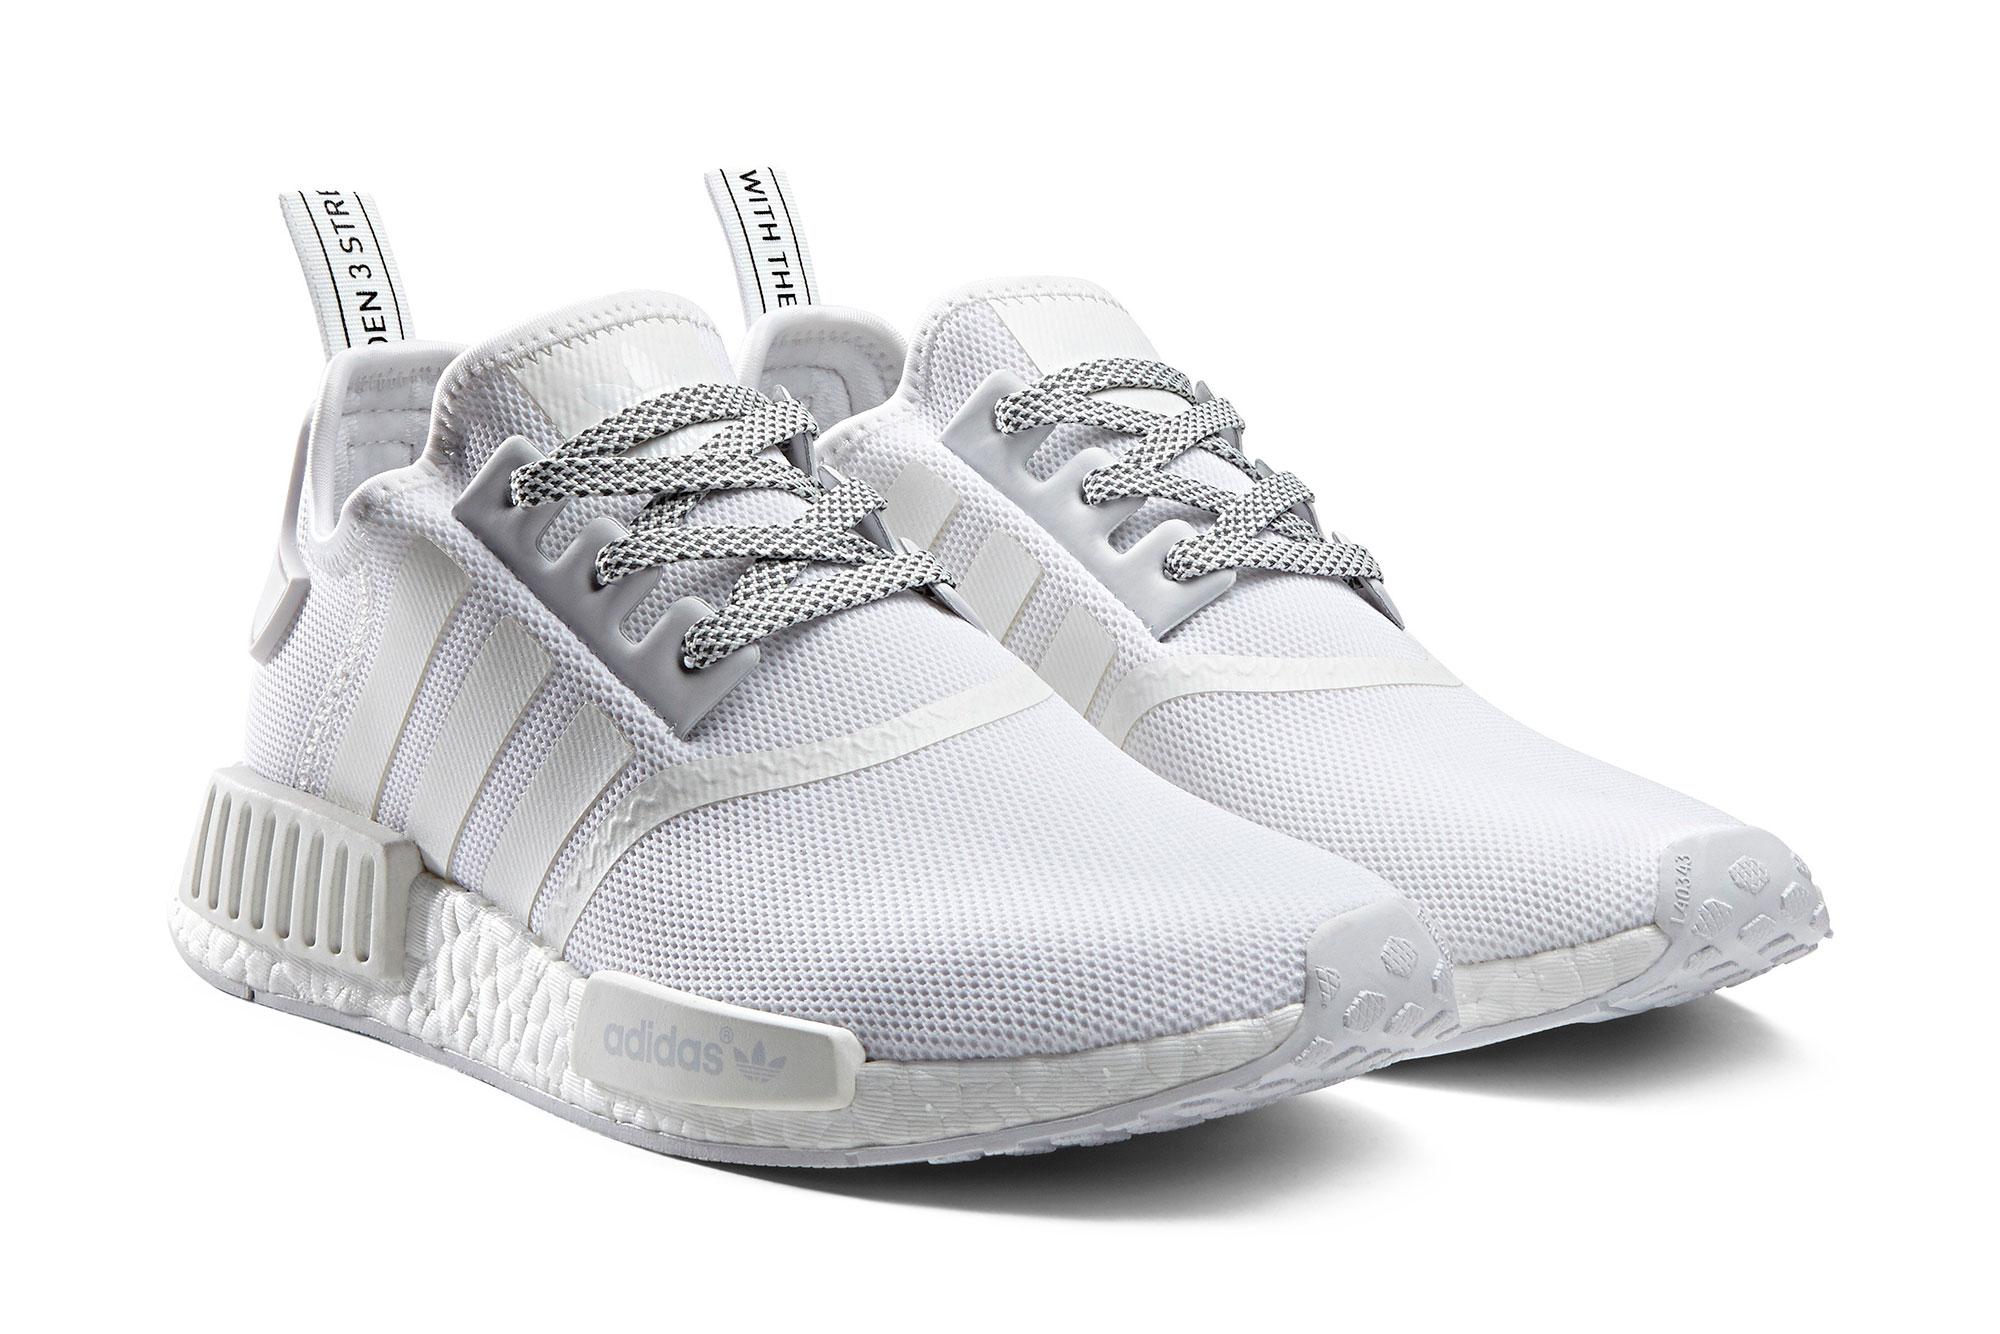 adidas-nmd-reflective-s31506